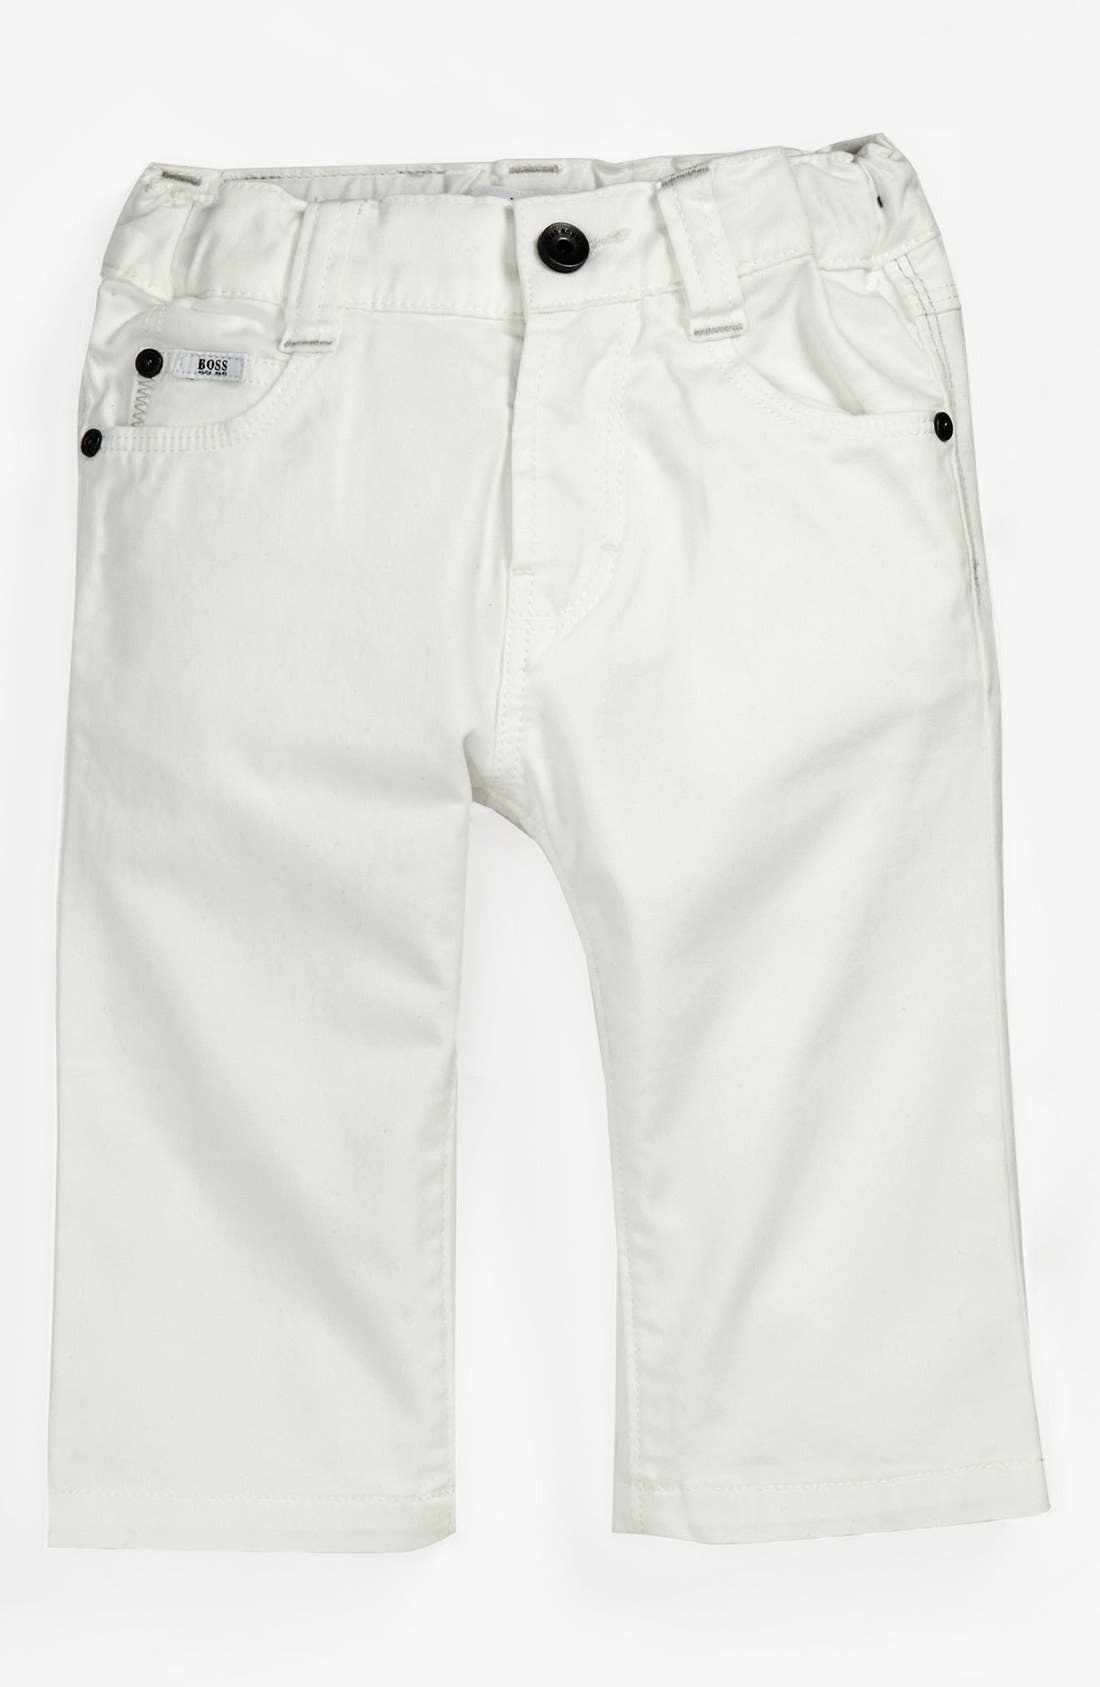 Main Image - BOSS Kidswear Twill Pants (Toddler)